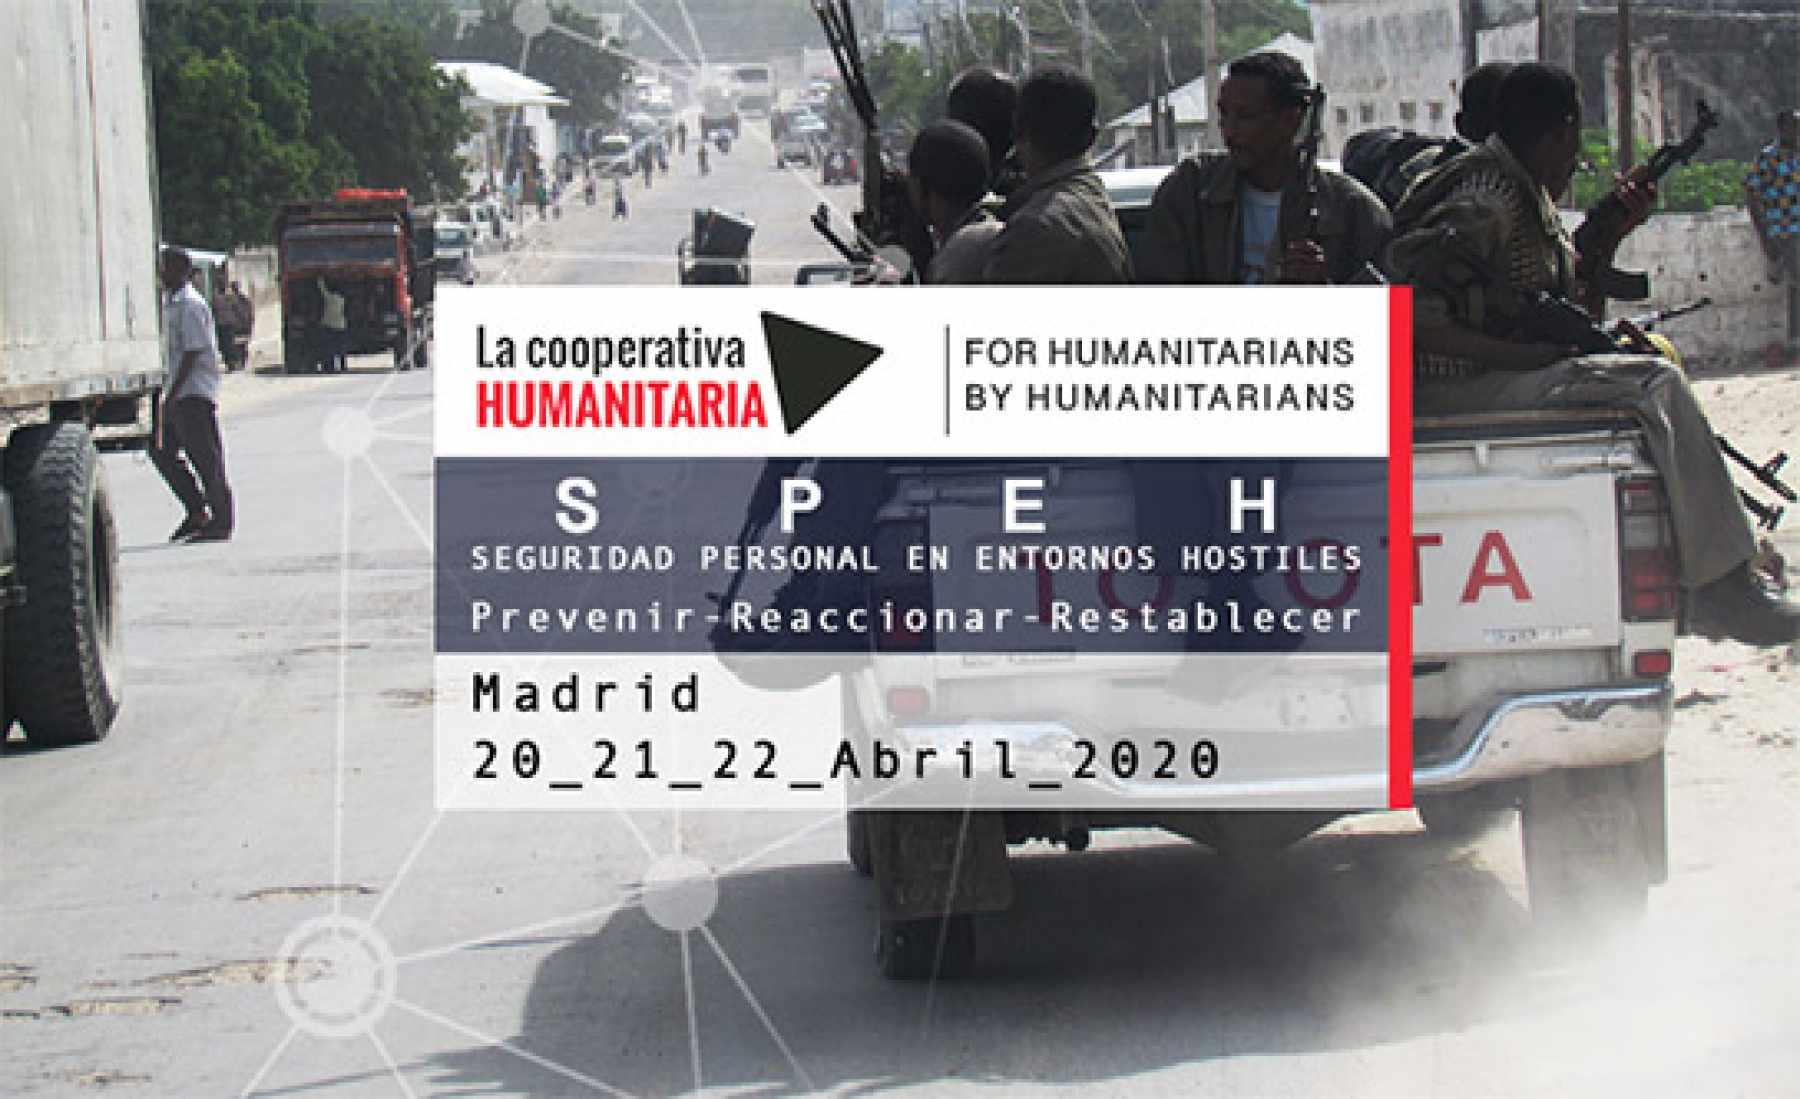 https://www.cooperativahumanitaria.org/es/speh